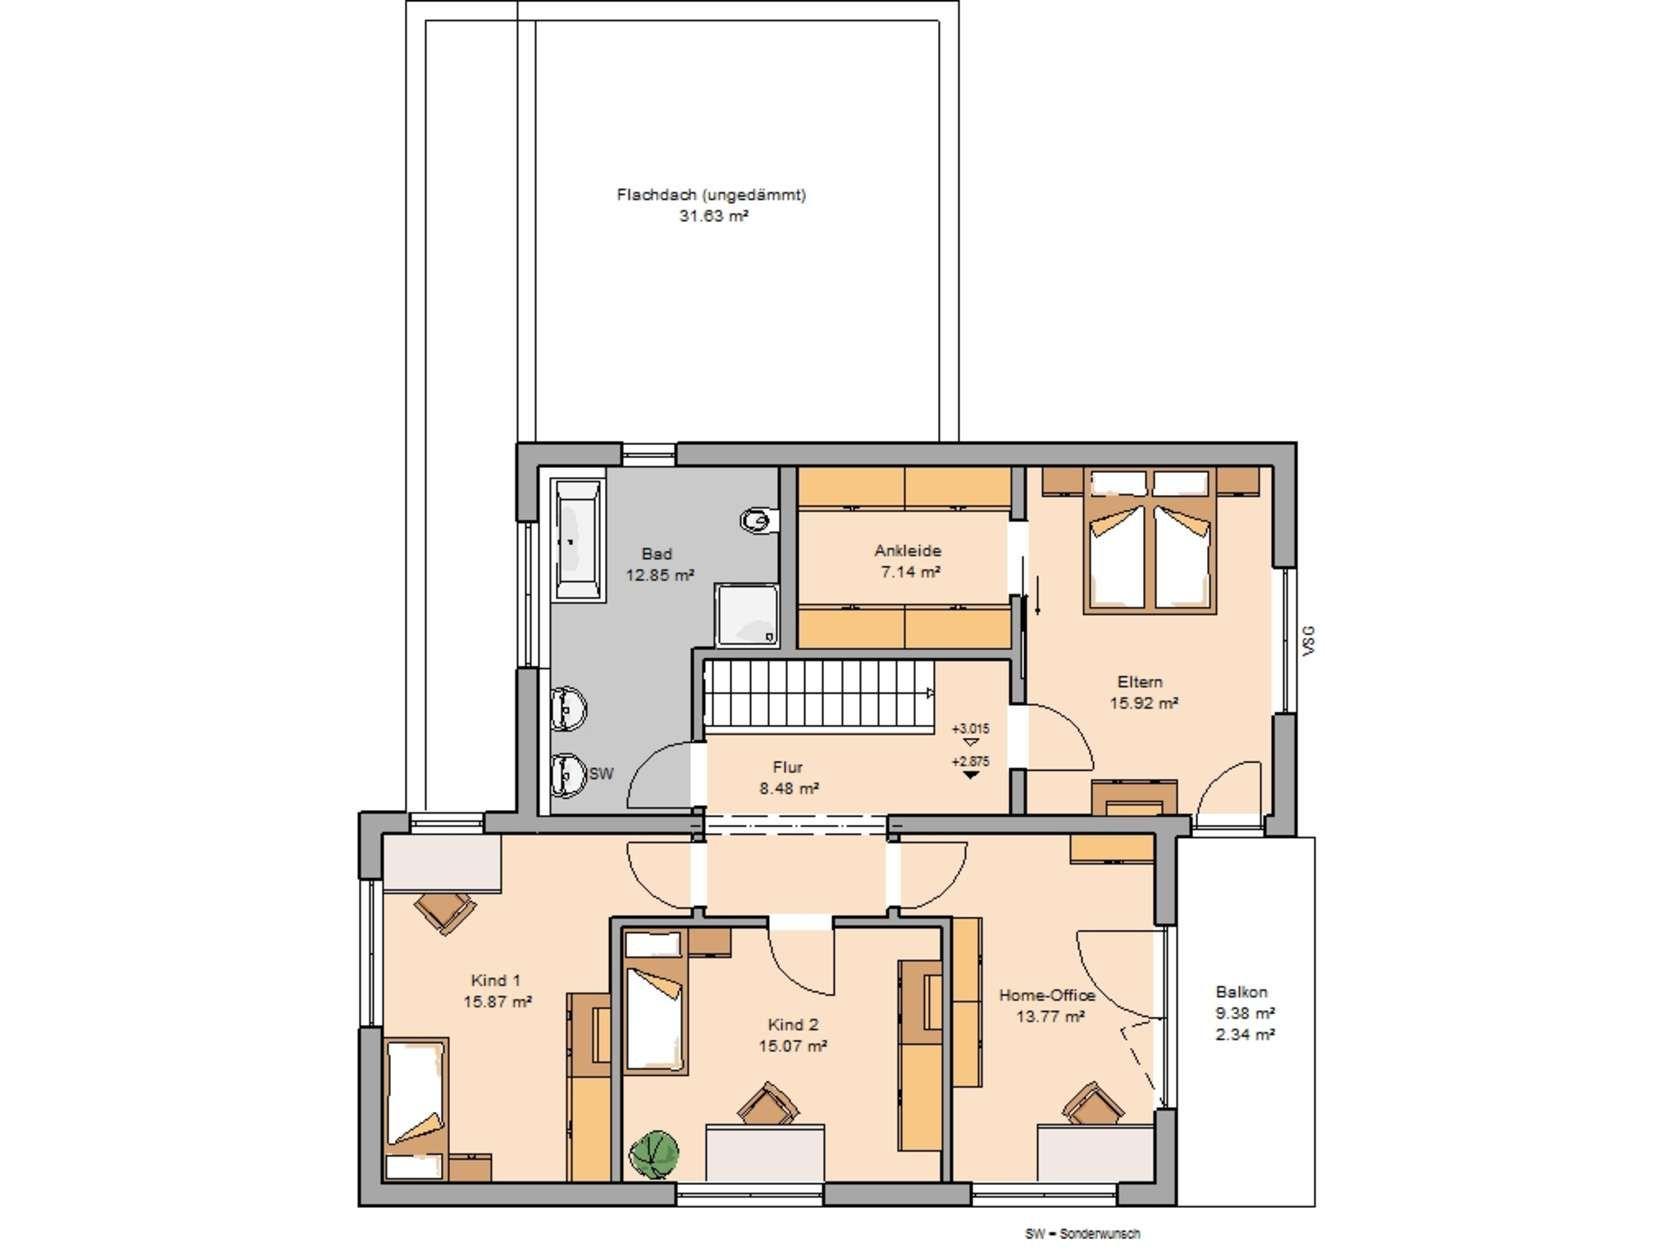 Erfreut 87 Hausverdrahtung Design Foto Ideen Fotos - Elektrische ...